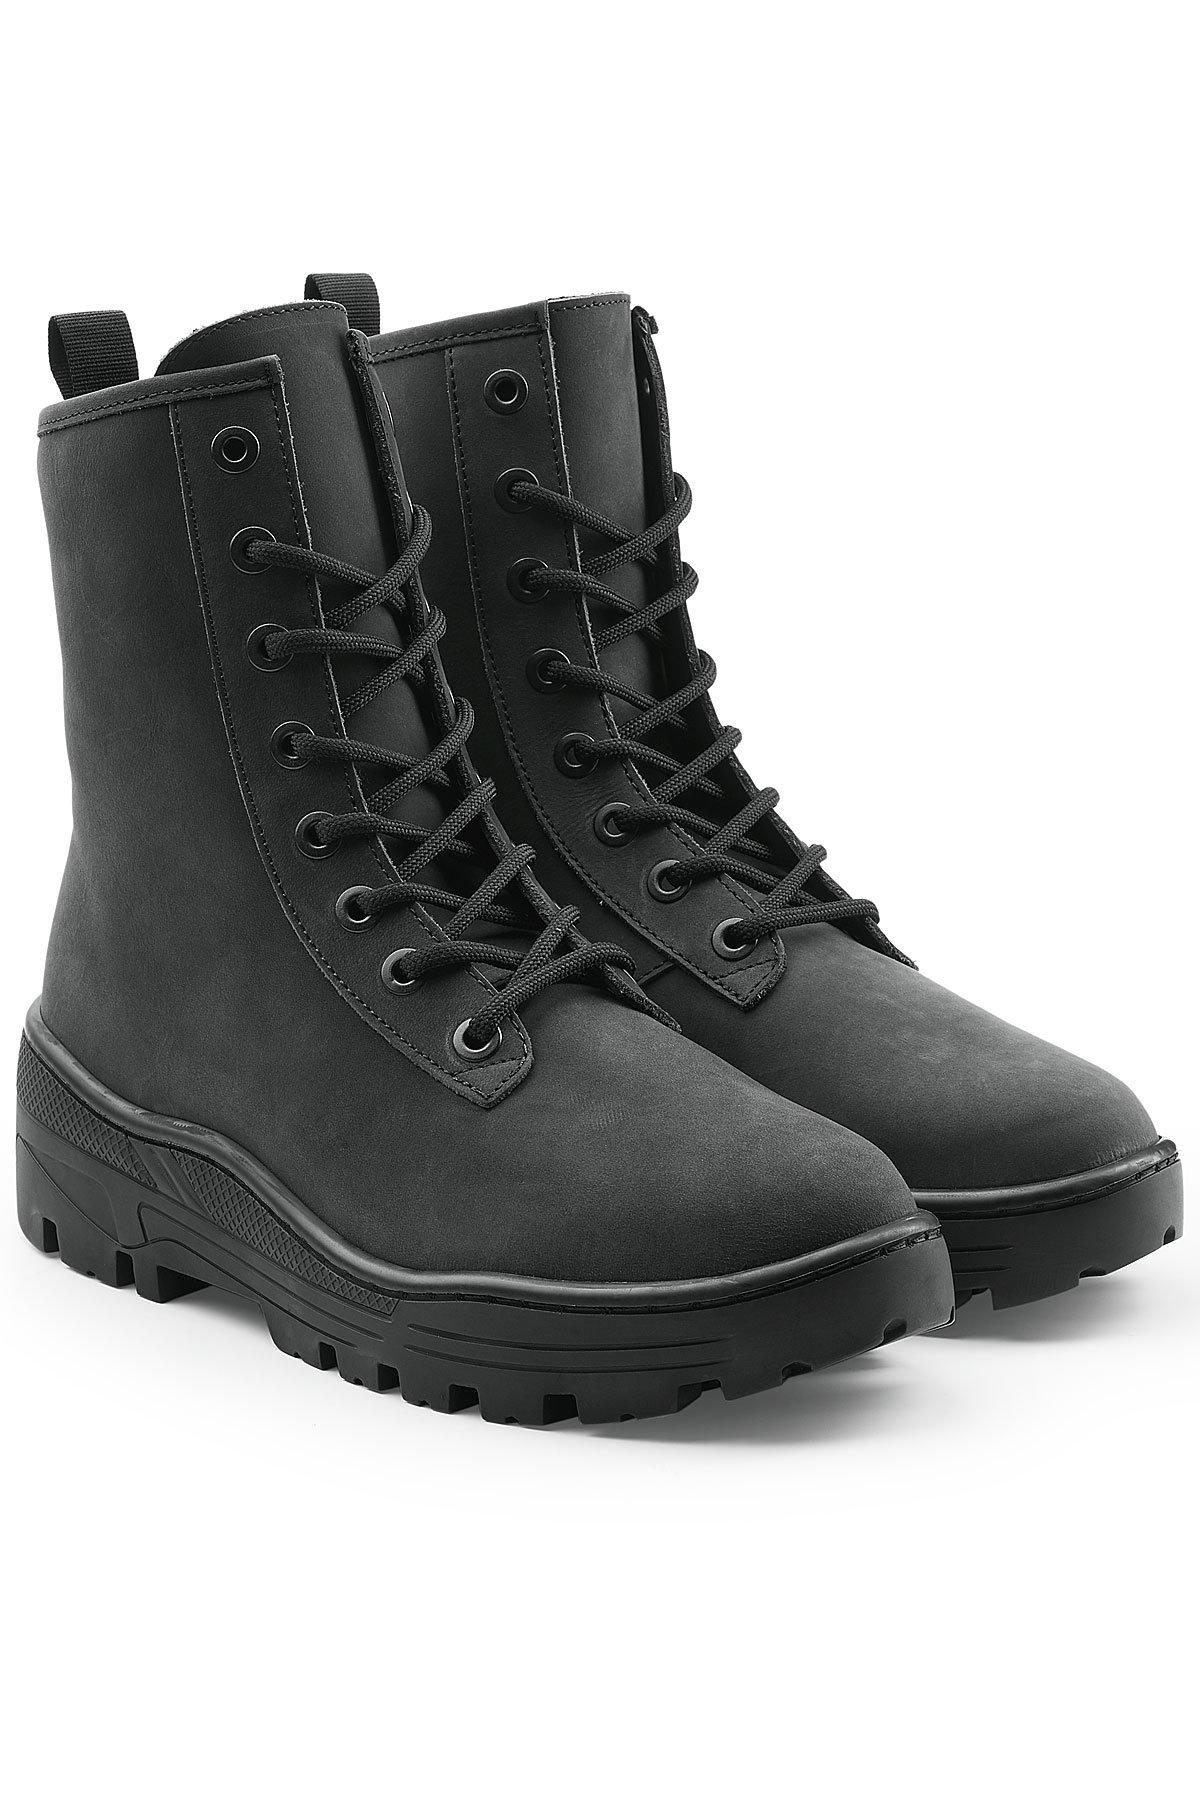 Lyst Black For Men Military Boots In Yeezy Nubuck pqSzUMV